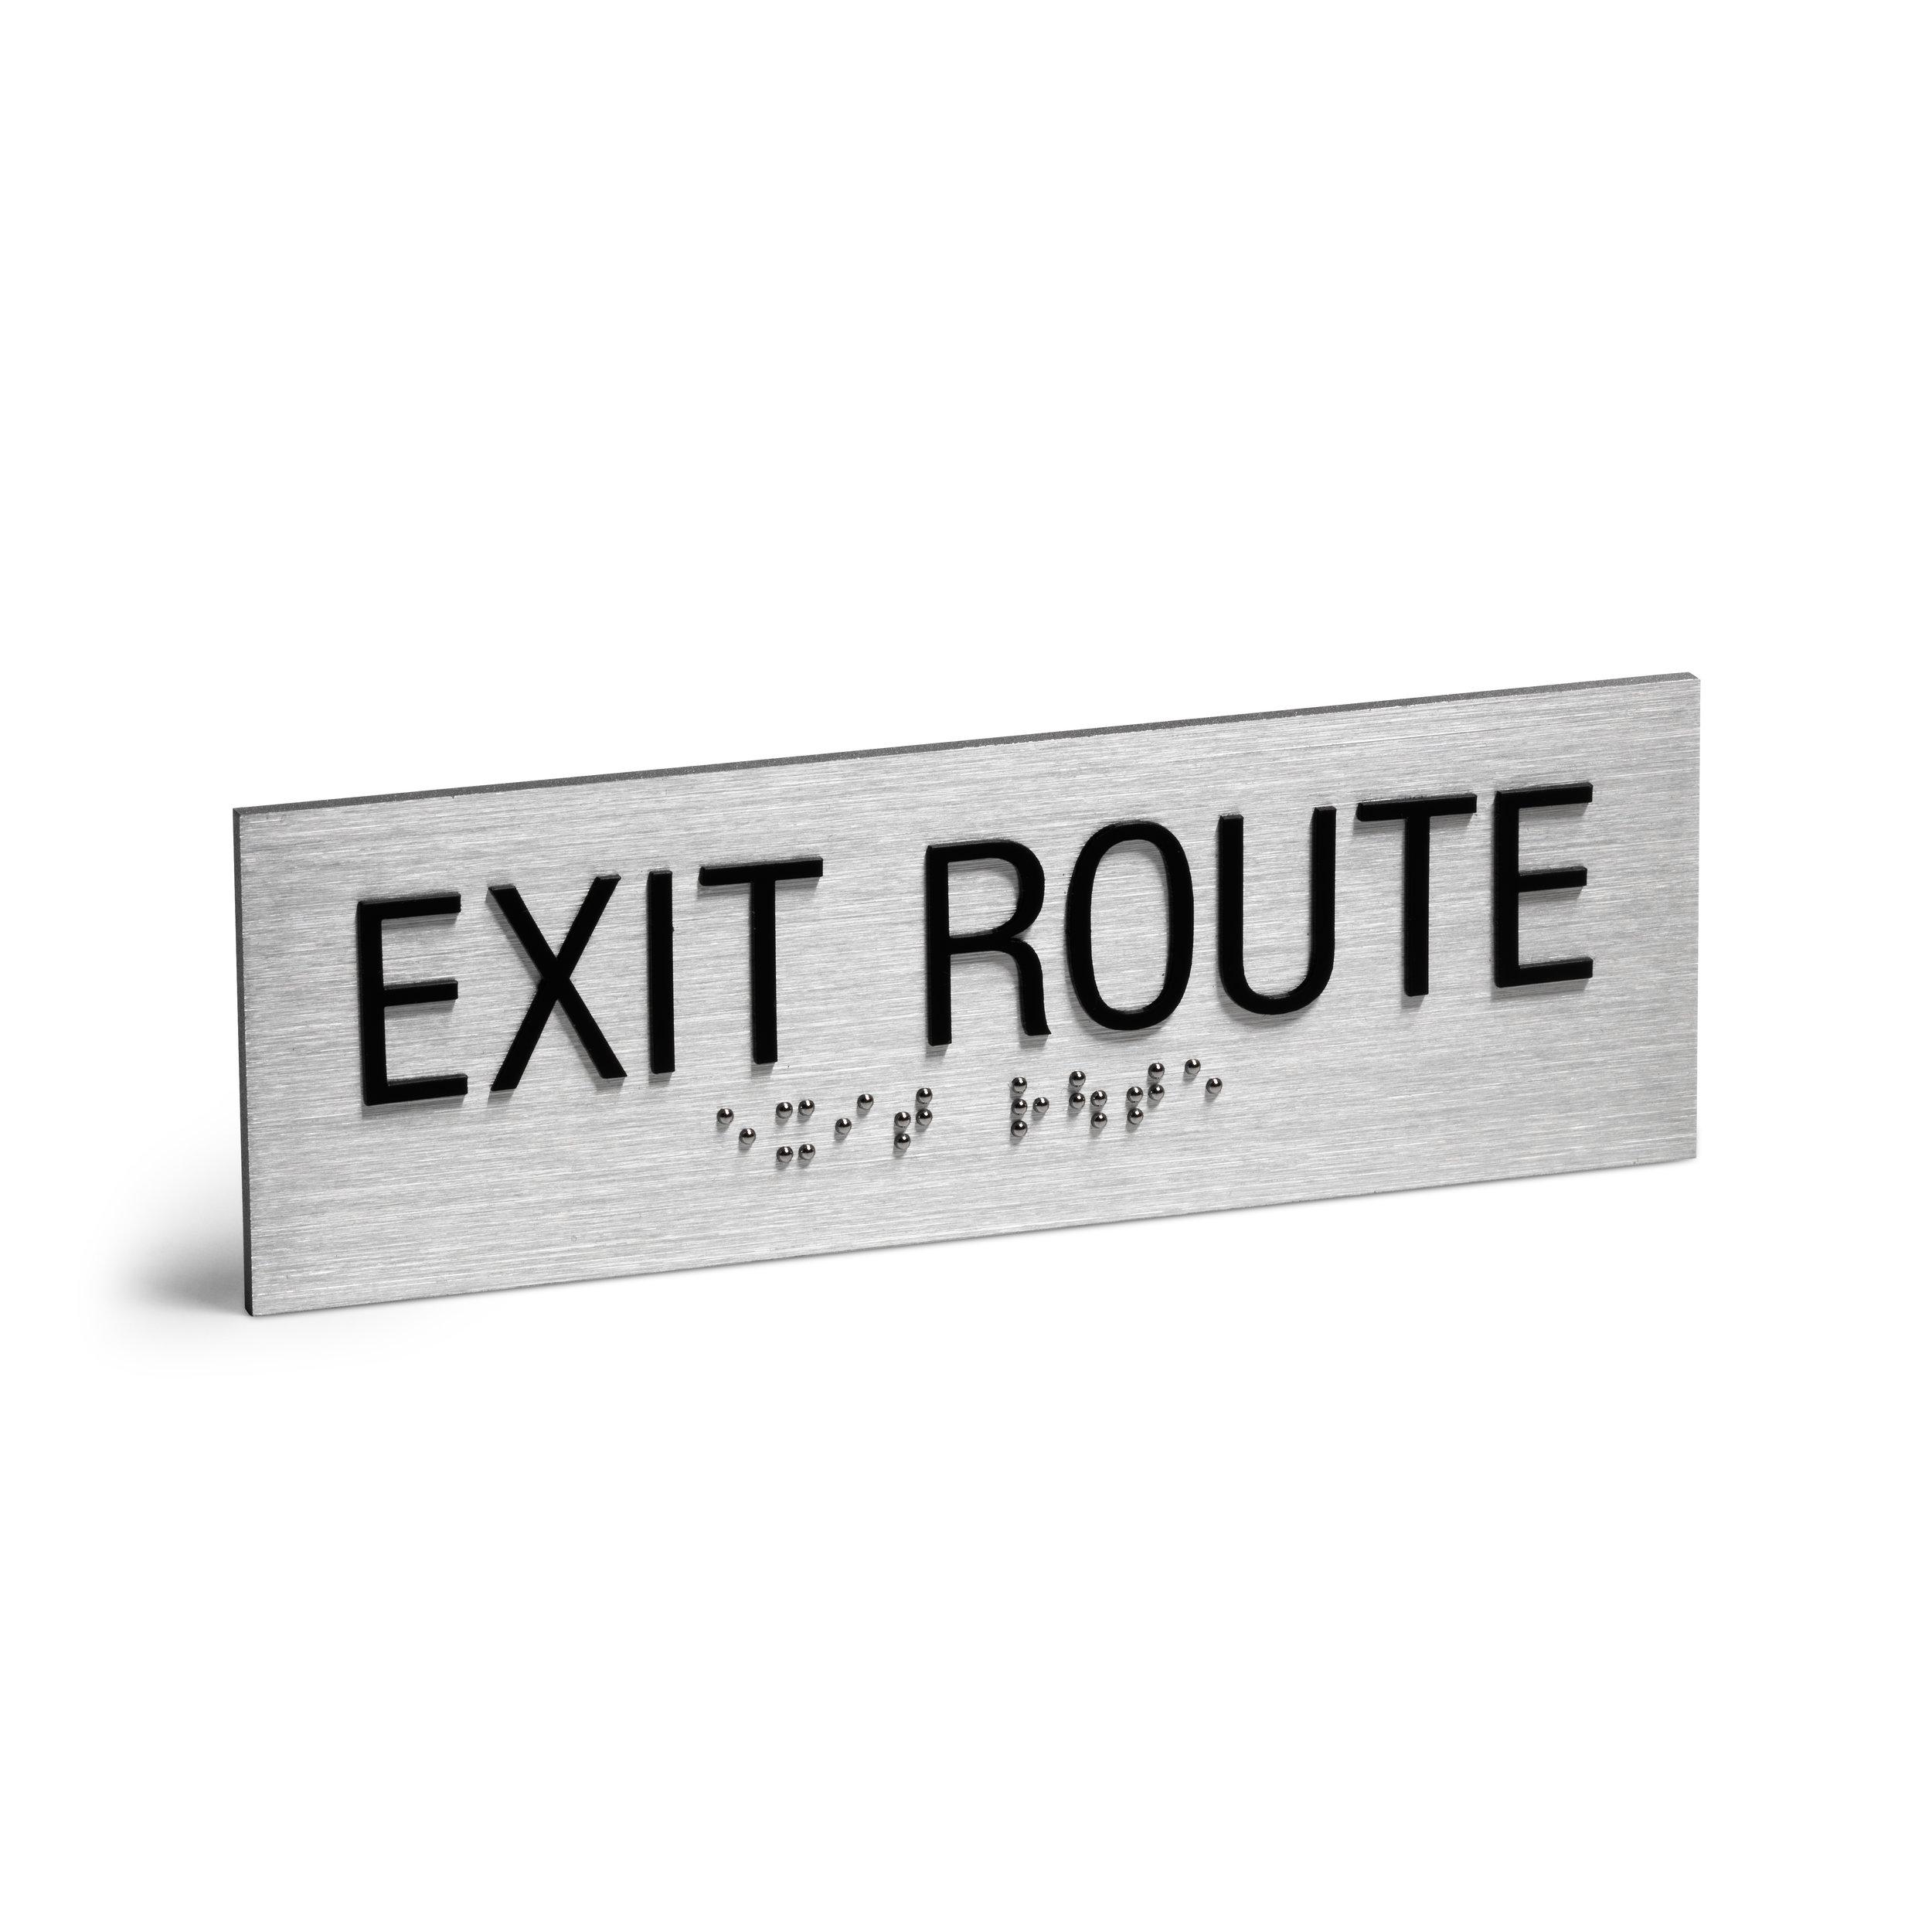 Exit Route Braille